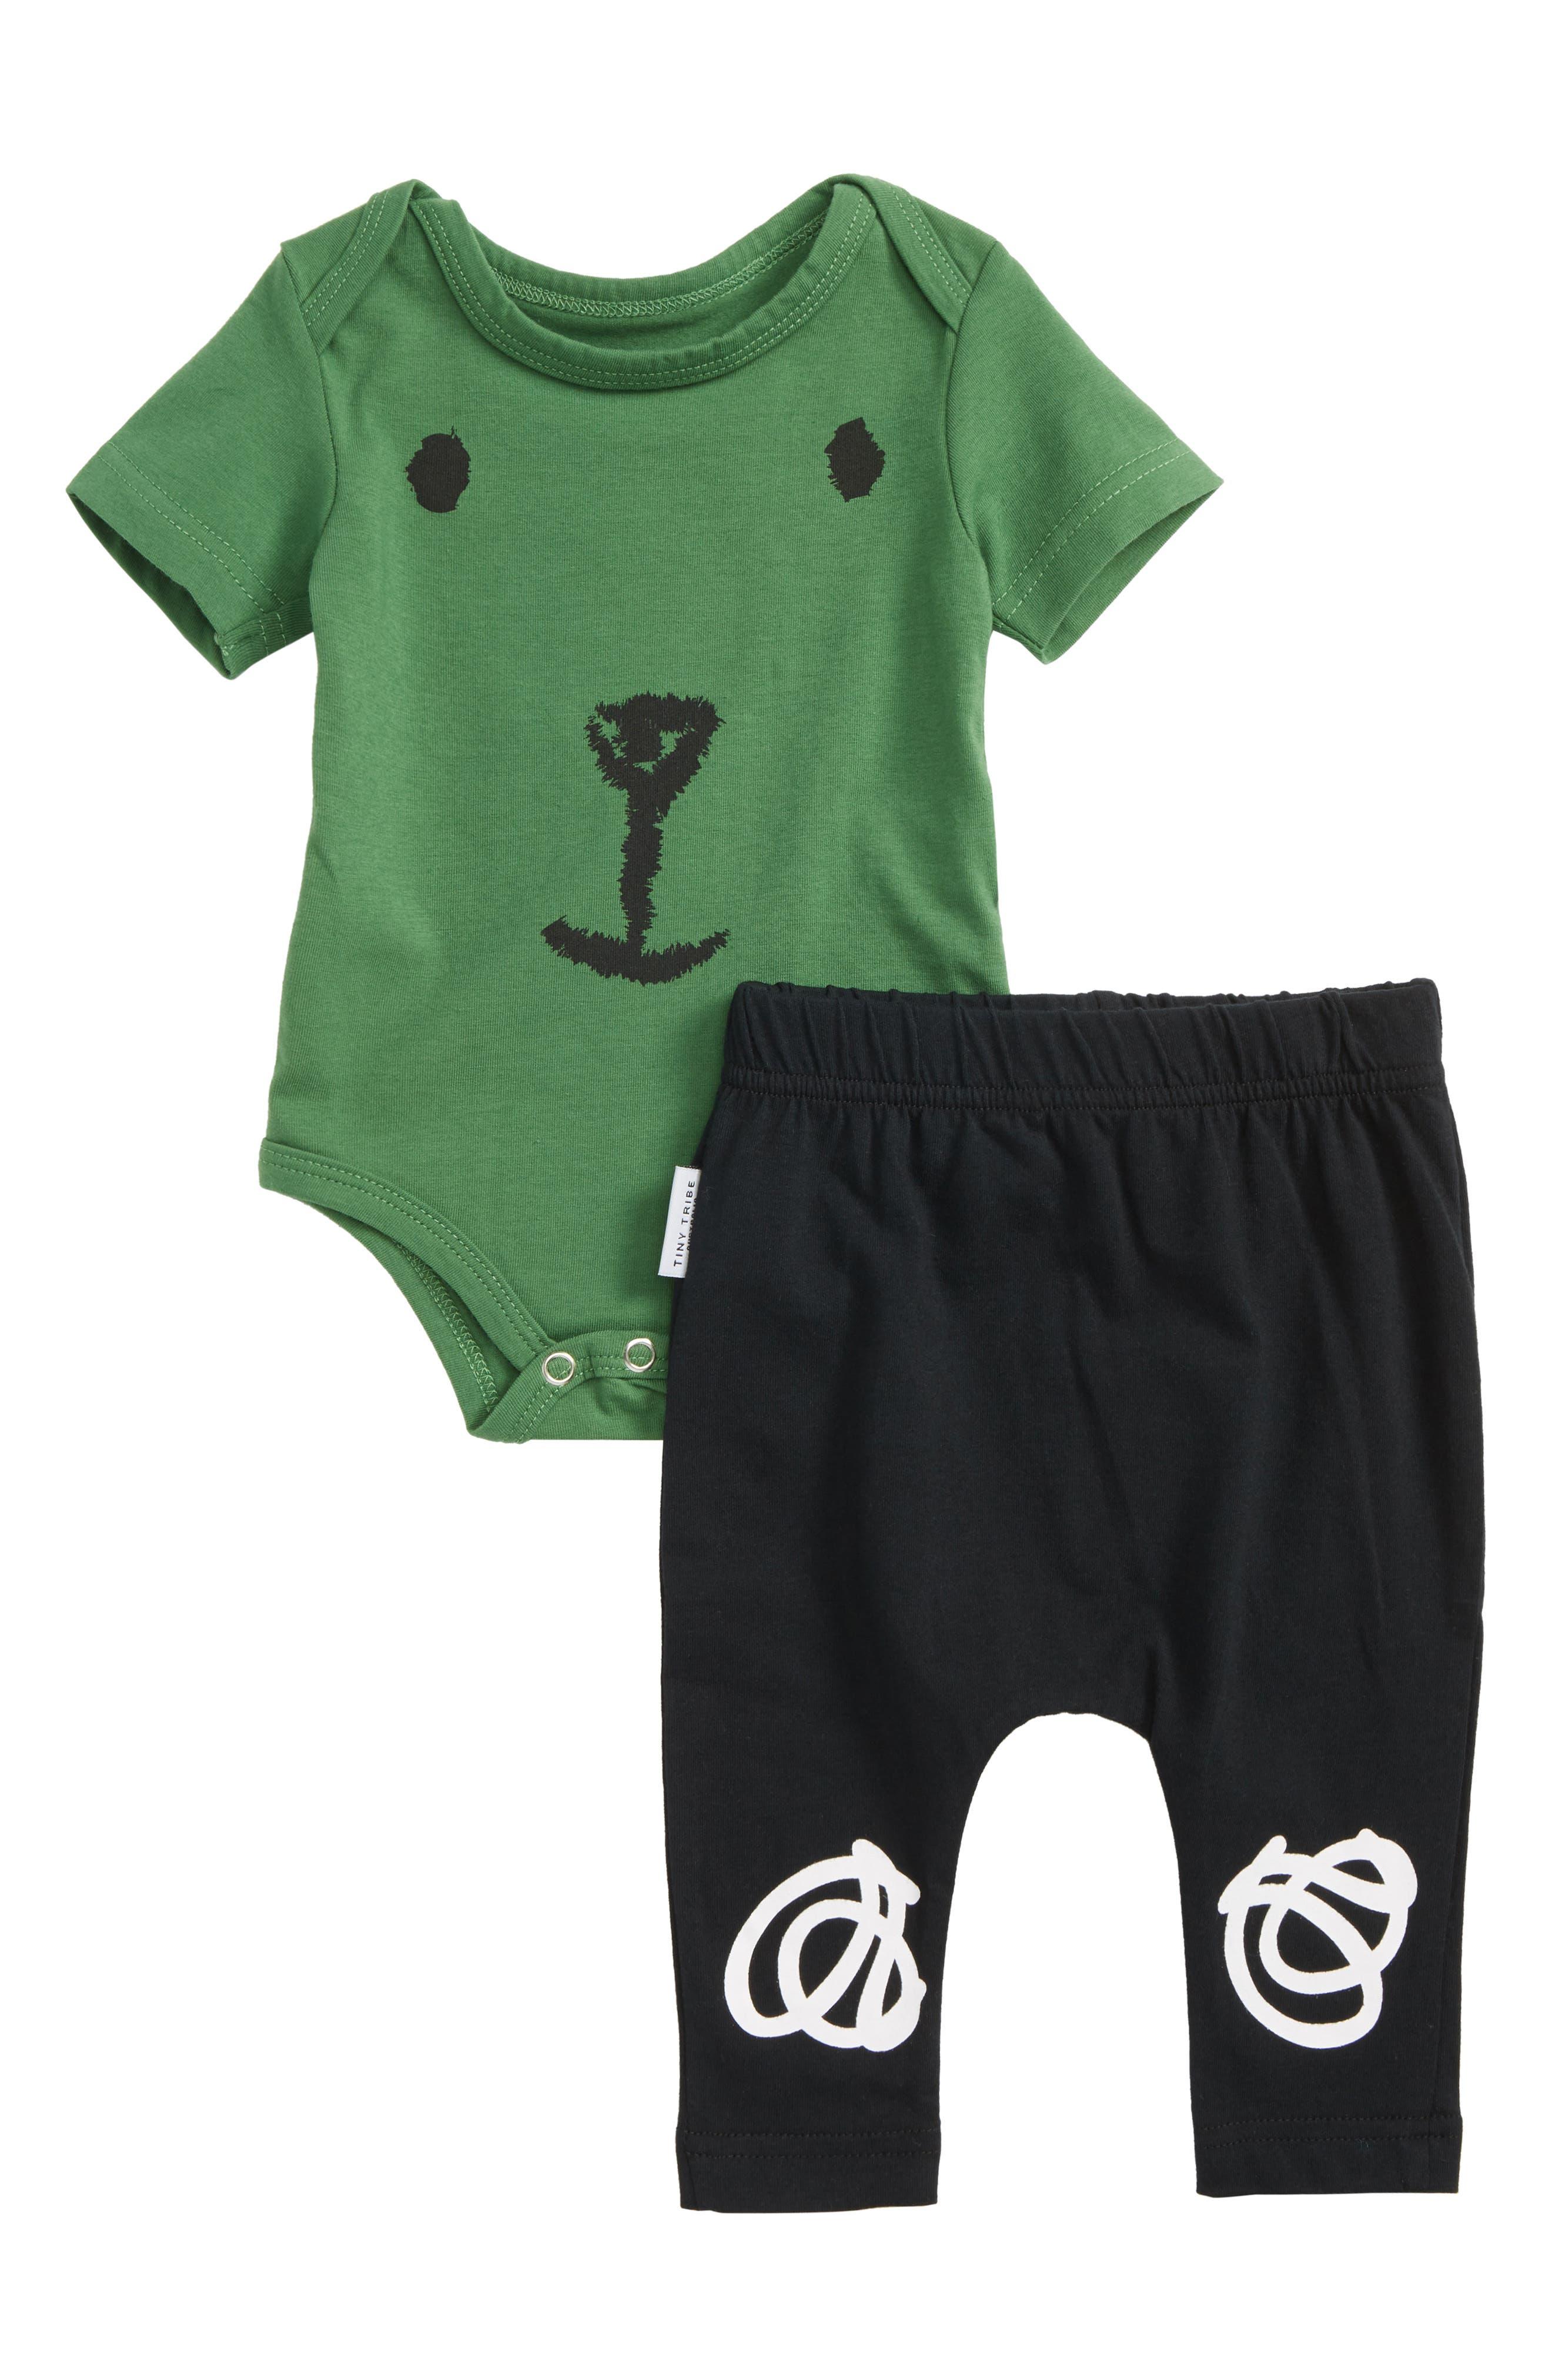 Honeybear Bodysuit & Pants Set,                             Main thumbnail 1, color,                             Green/ Black